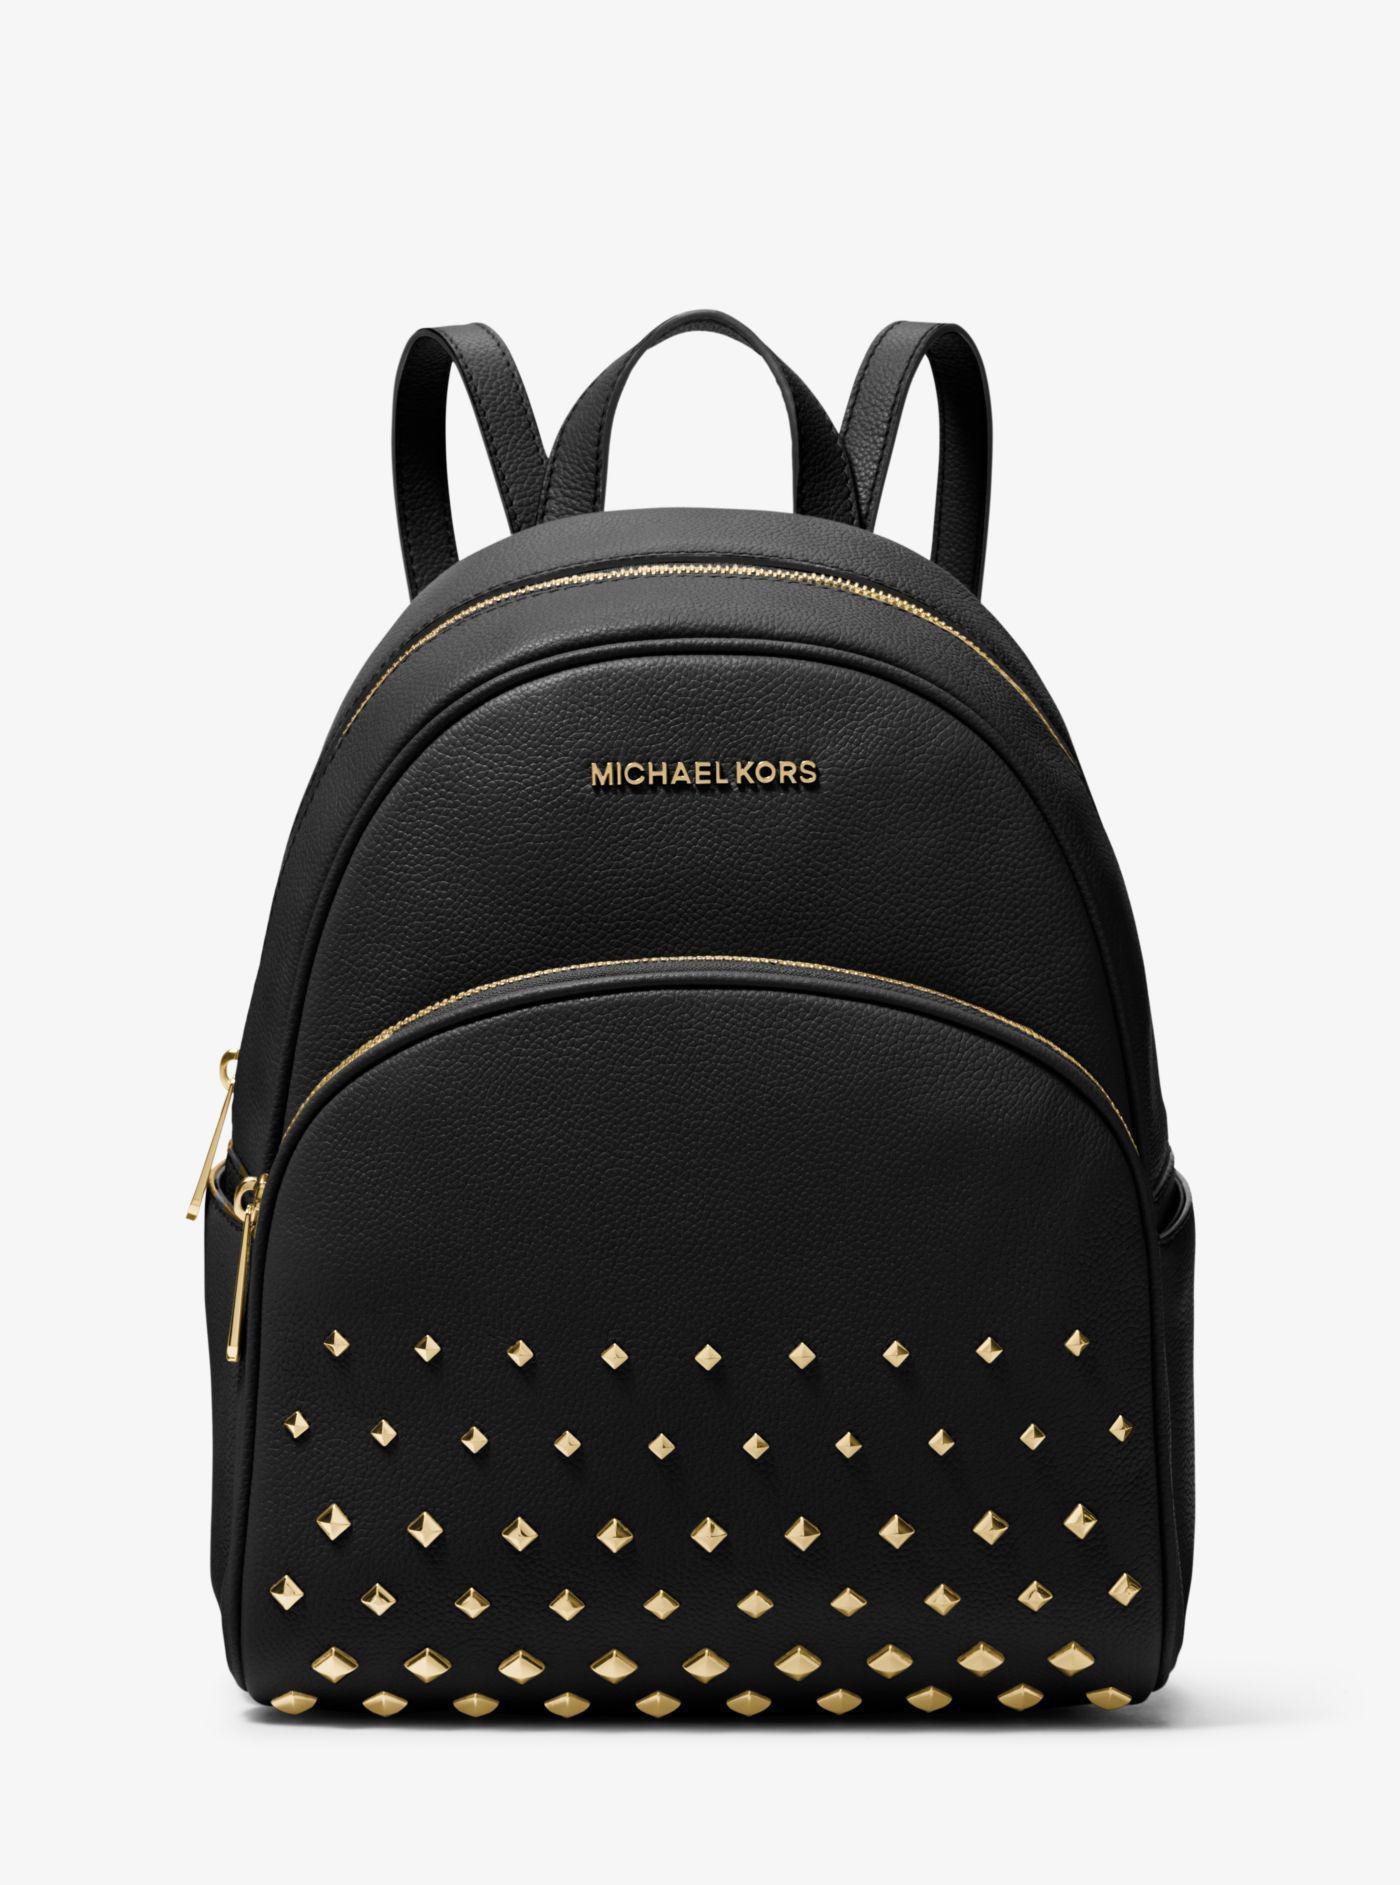 Michael Kors - Black Abbey Medium Studded Pebbled Leather Backpack - Lyst.  View fullscreen 9625b072625ba